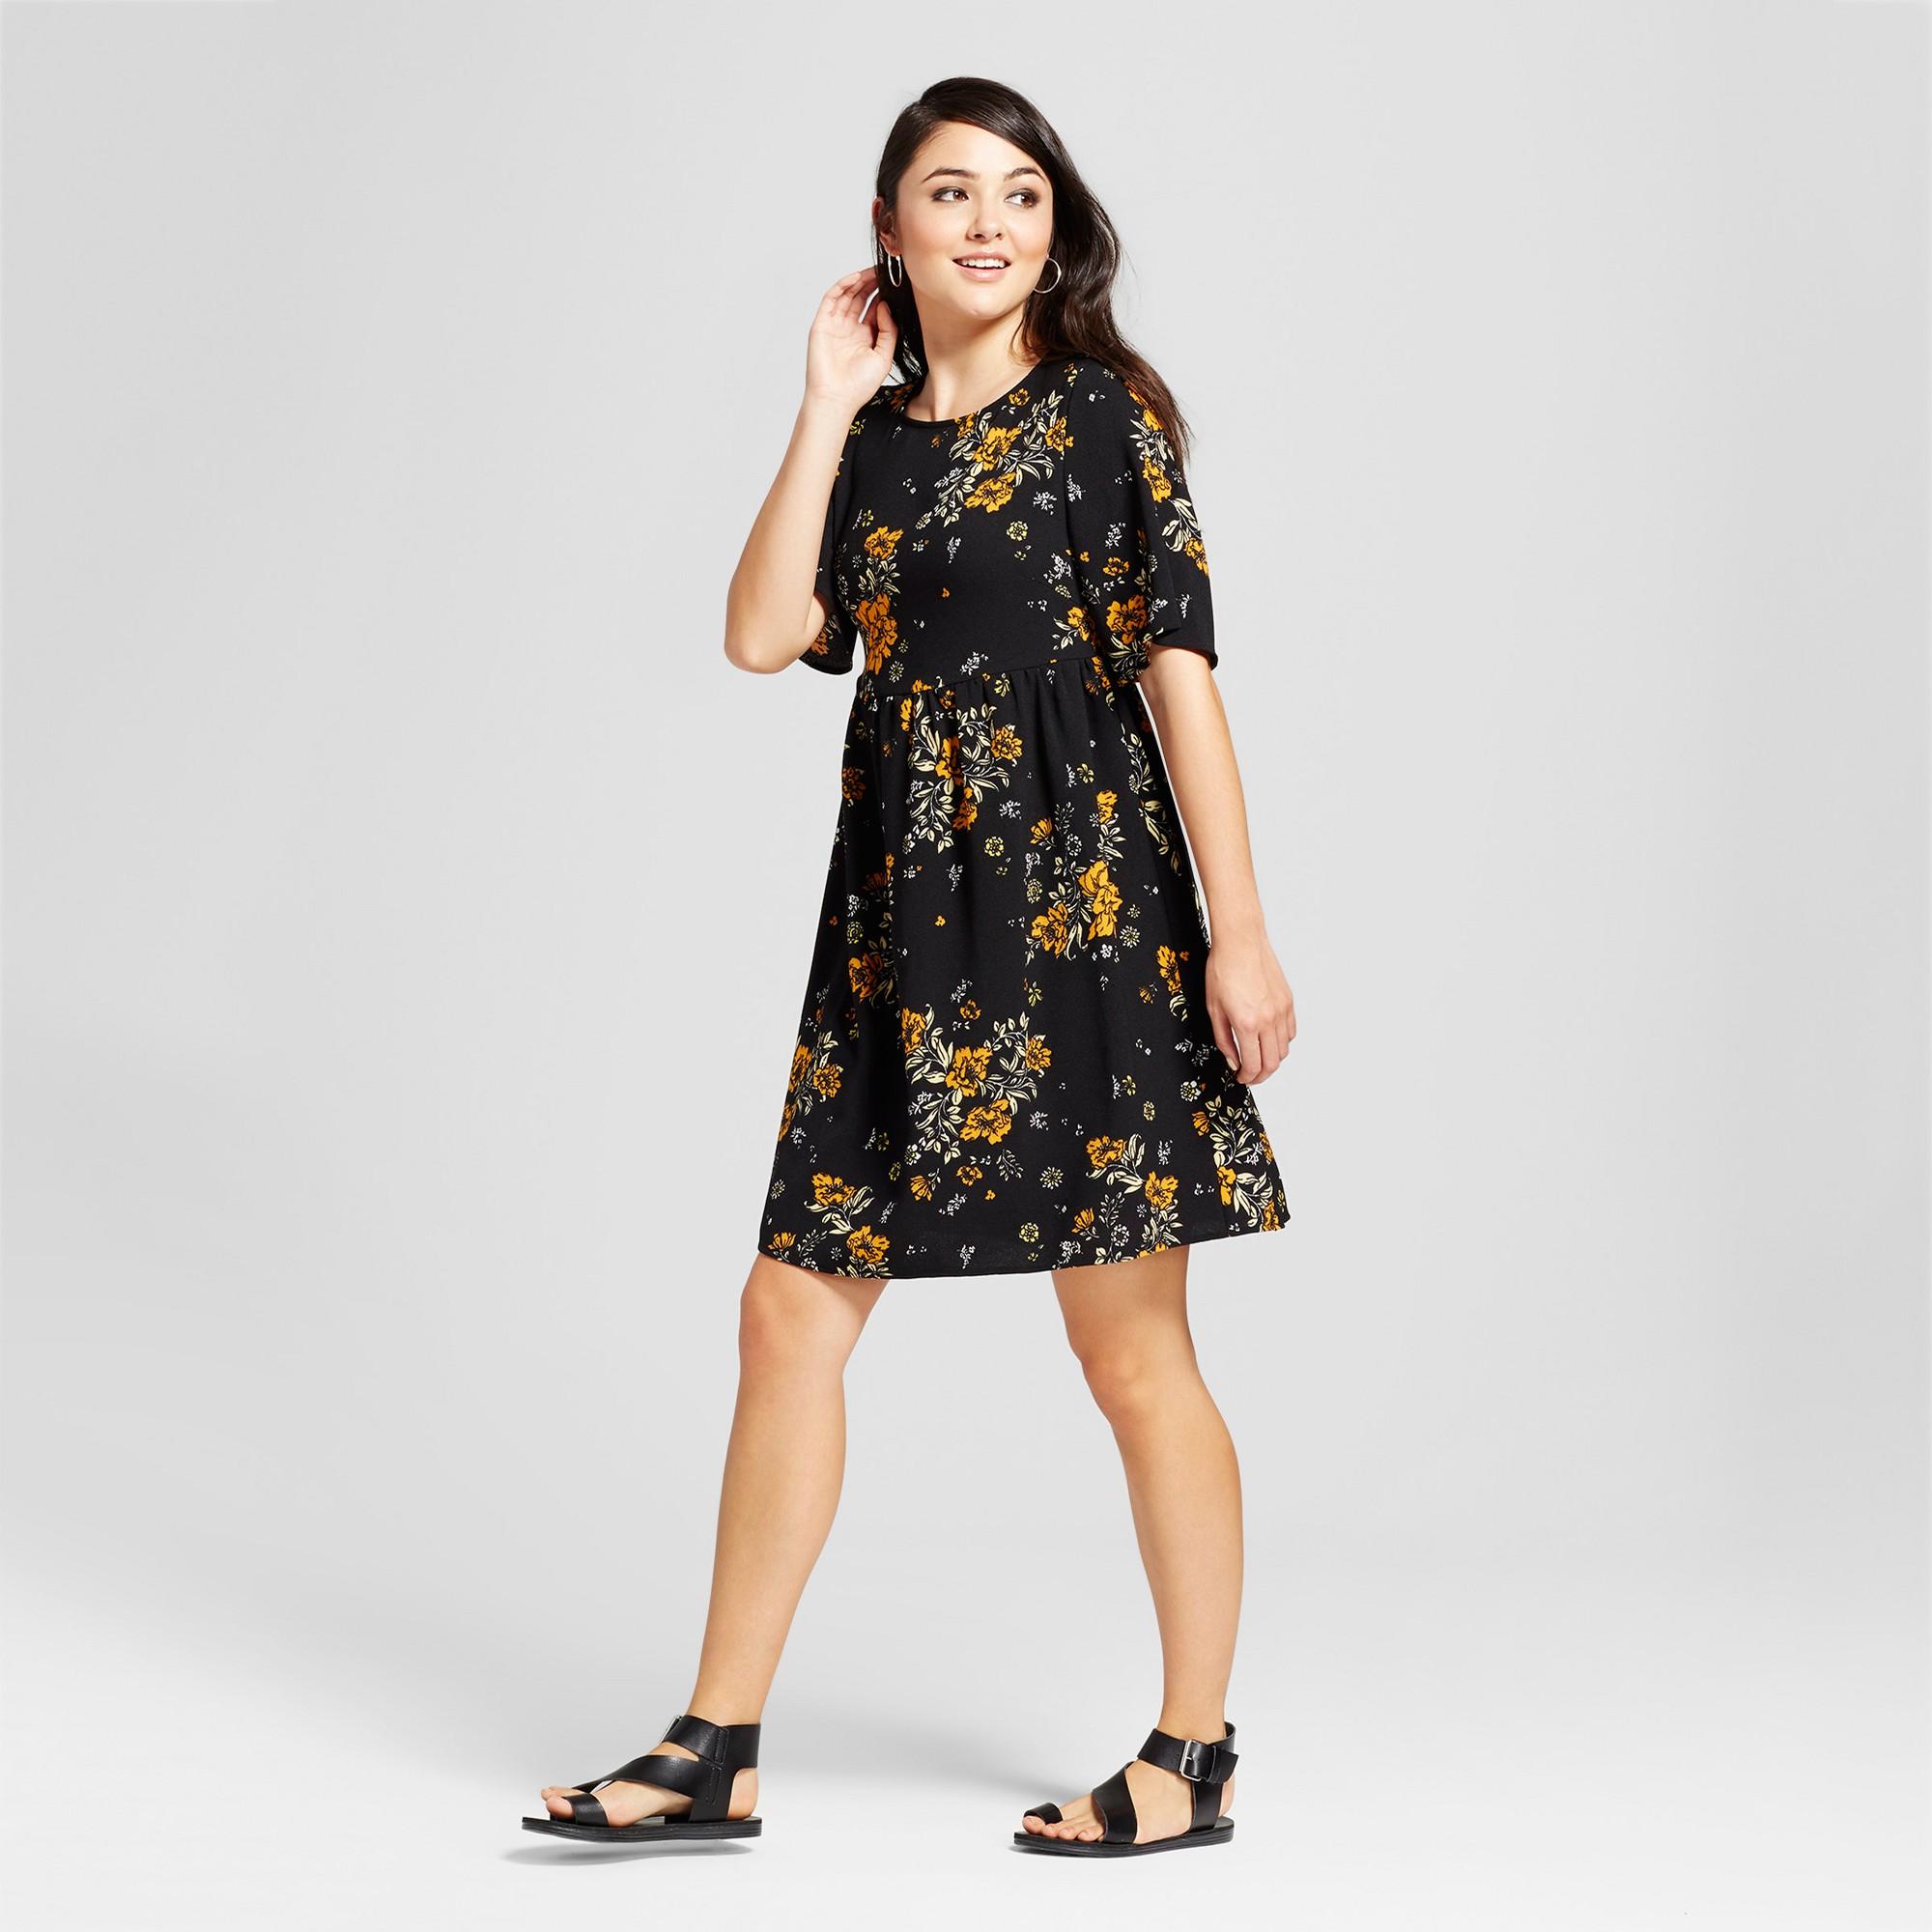 65d4b611e5 Women's Floral Print Short Sleeve Lace-Up Back Babydoll Dress - Alison  Andrews Black XL